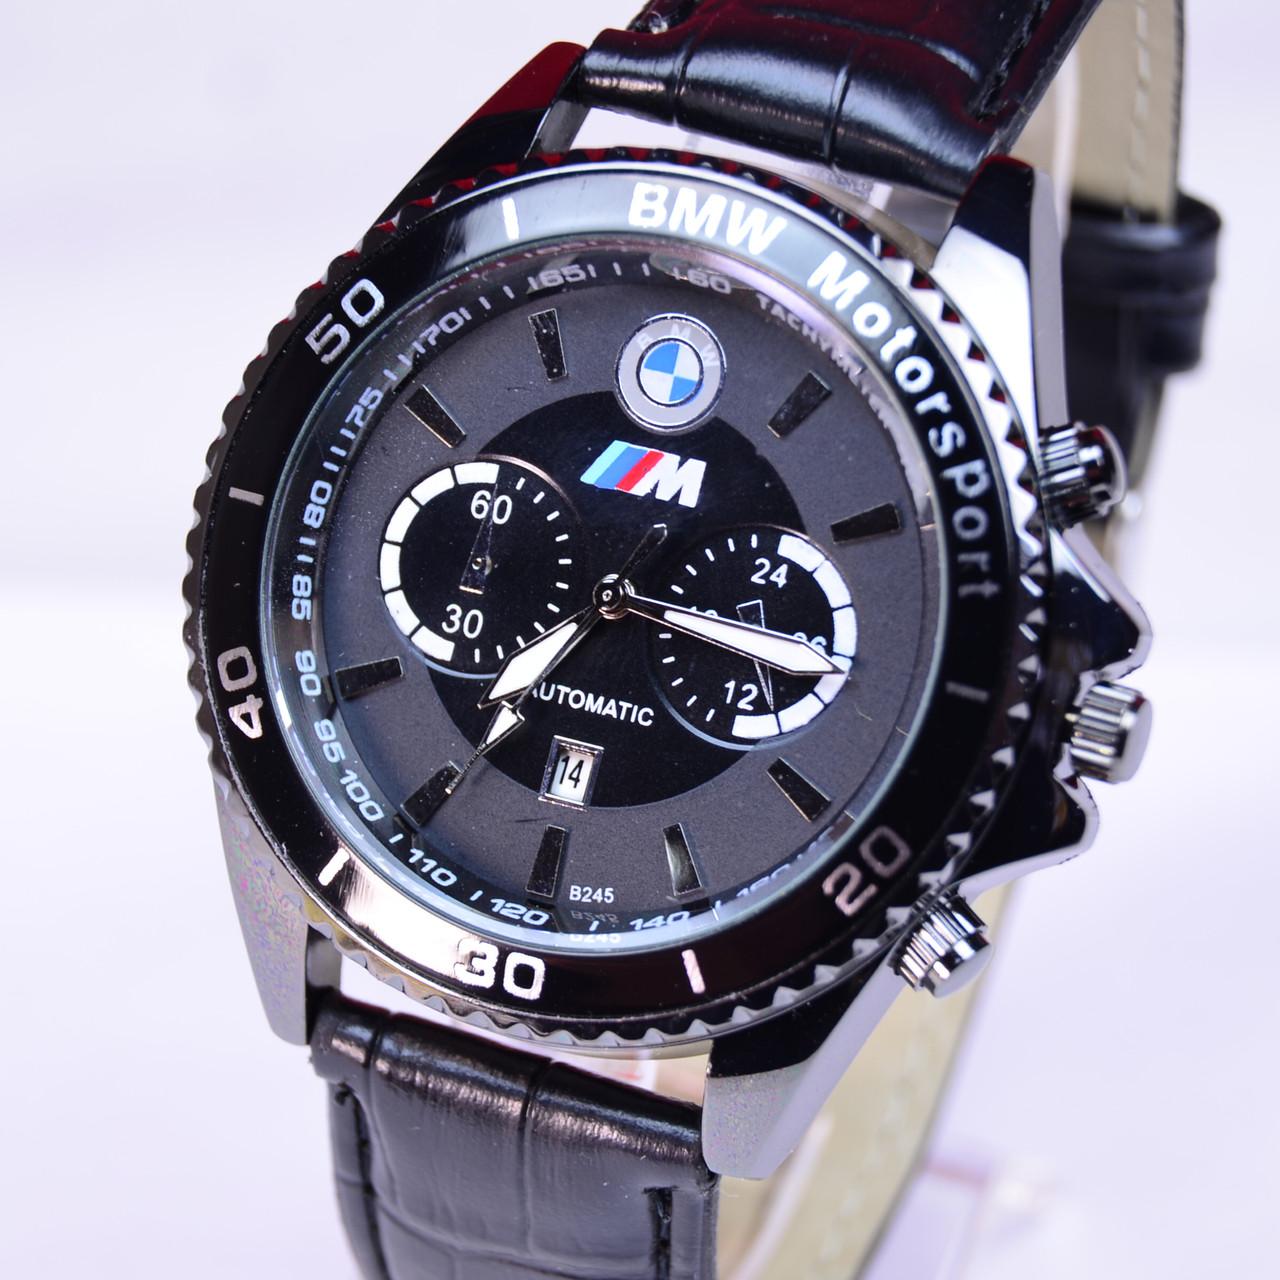 3525e0d8 Мужские наручные часы BMW (B243) кварц календарь - интернет- магазин